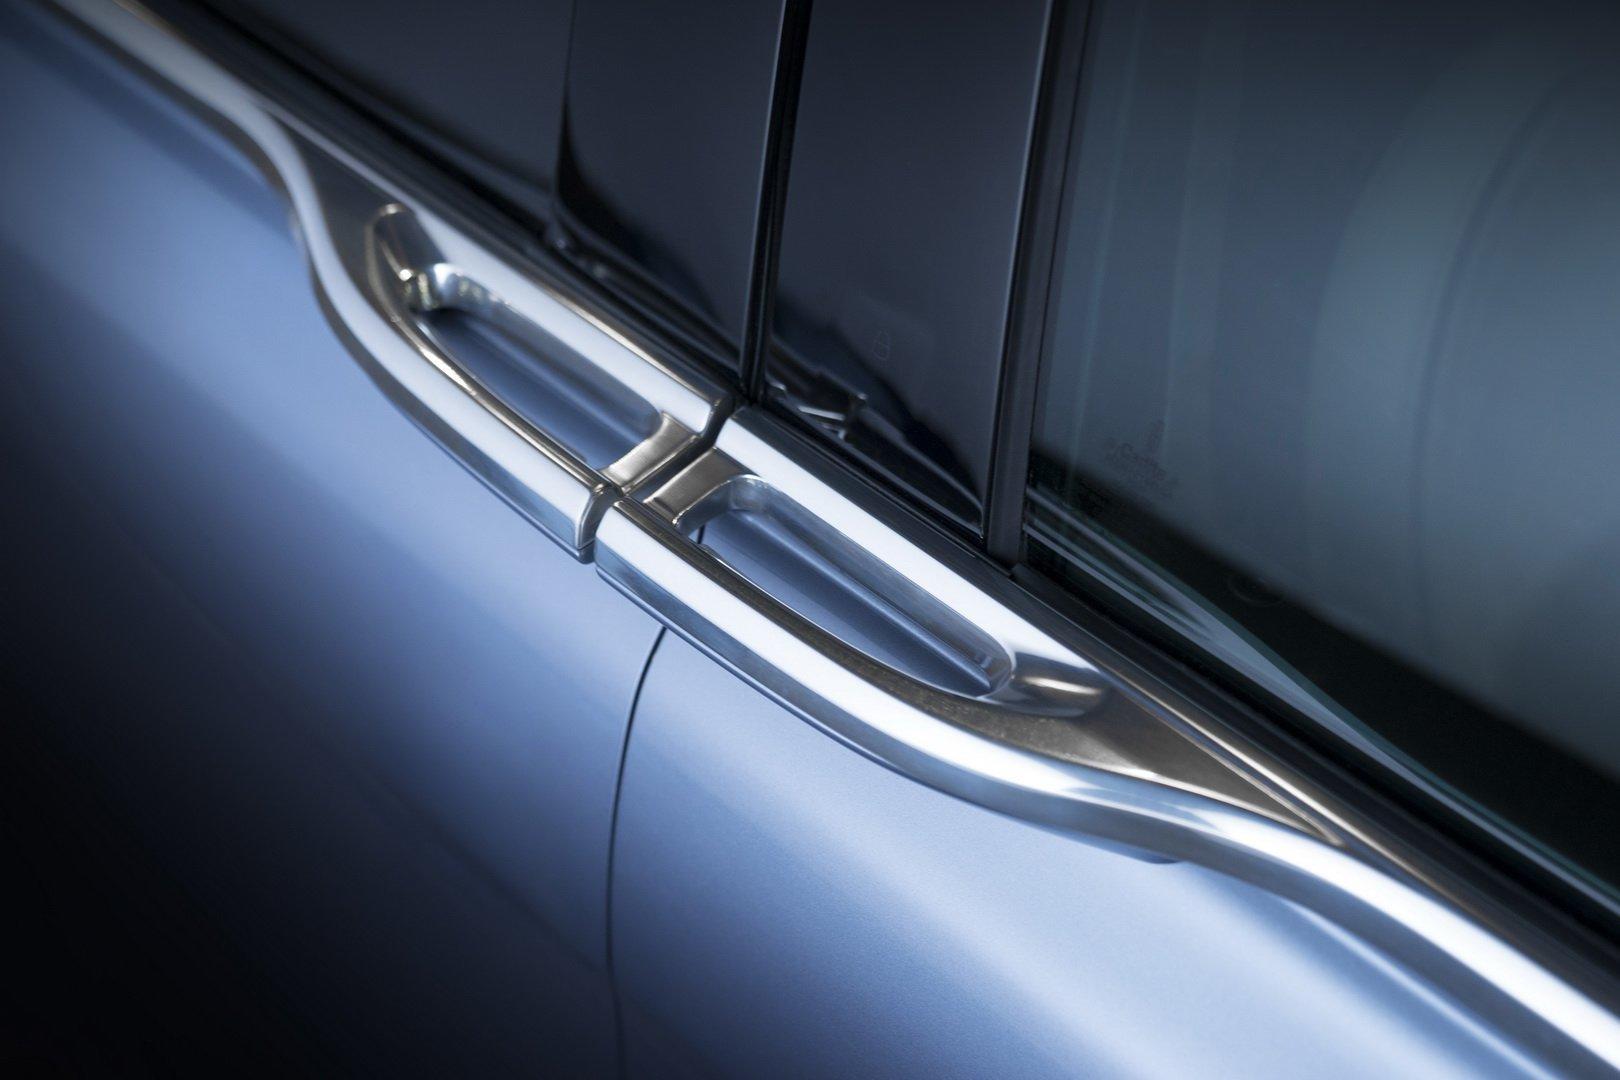 Lincoln Continental 80th Anniversary Coach Door Edition - Lincoln Continental 80th Anniversary Coach Door Edition